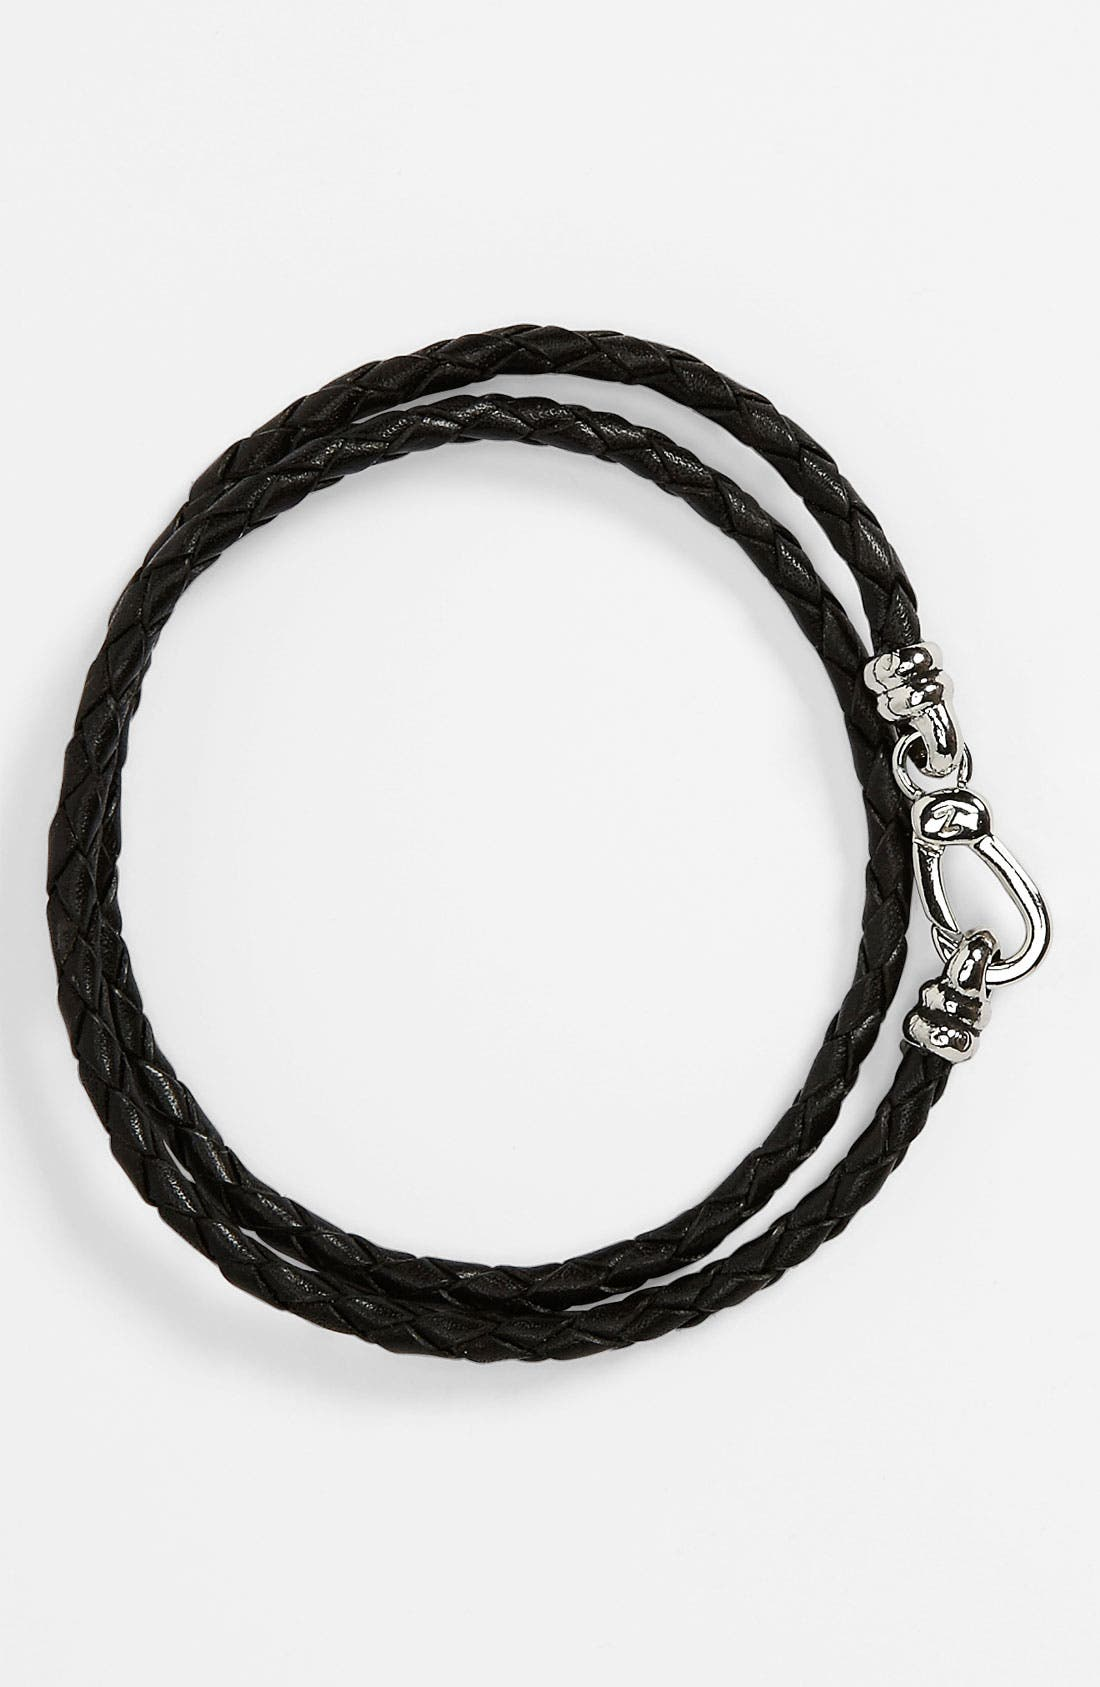 Alternate Image 1 Selected - Zack Braided Leather Bracelet